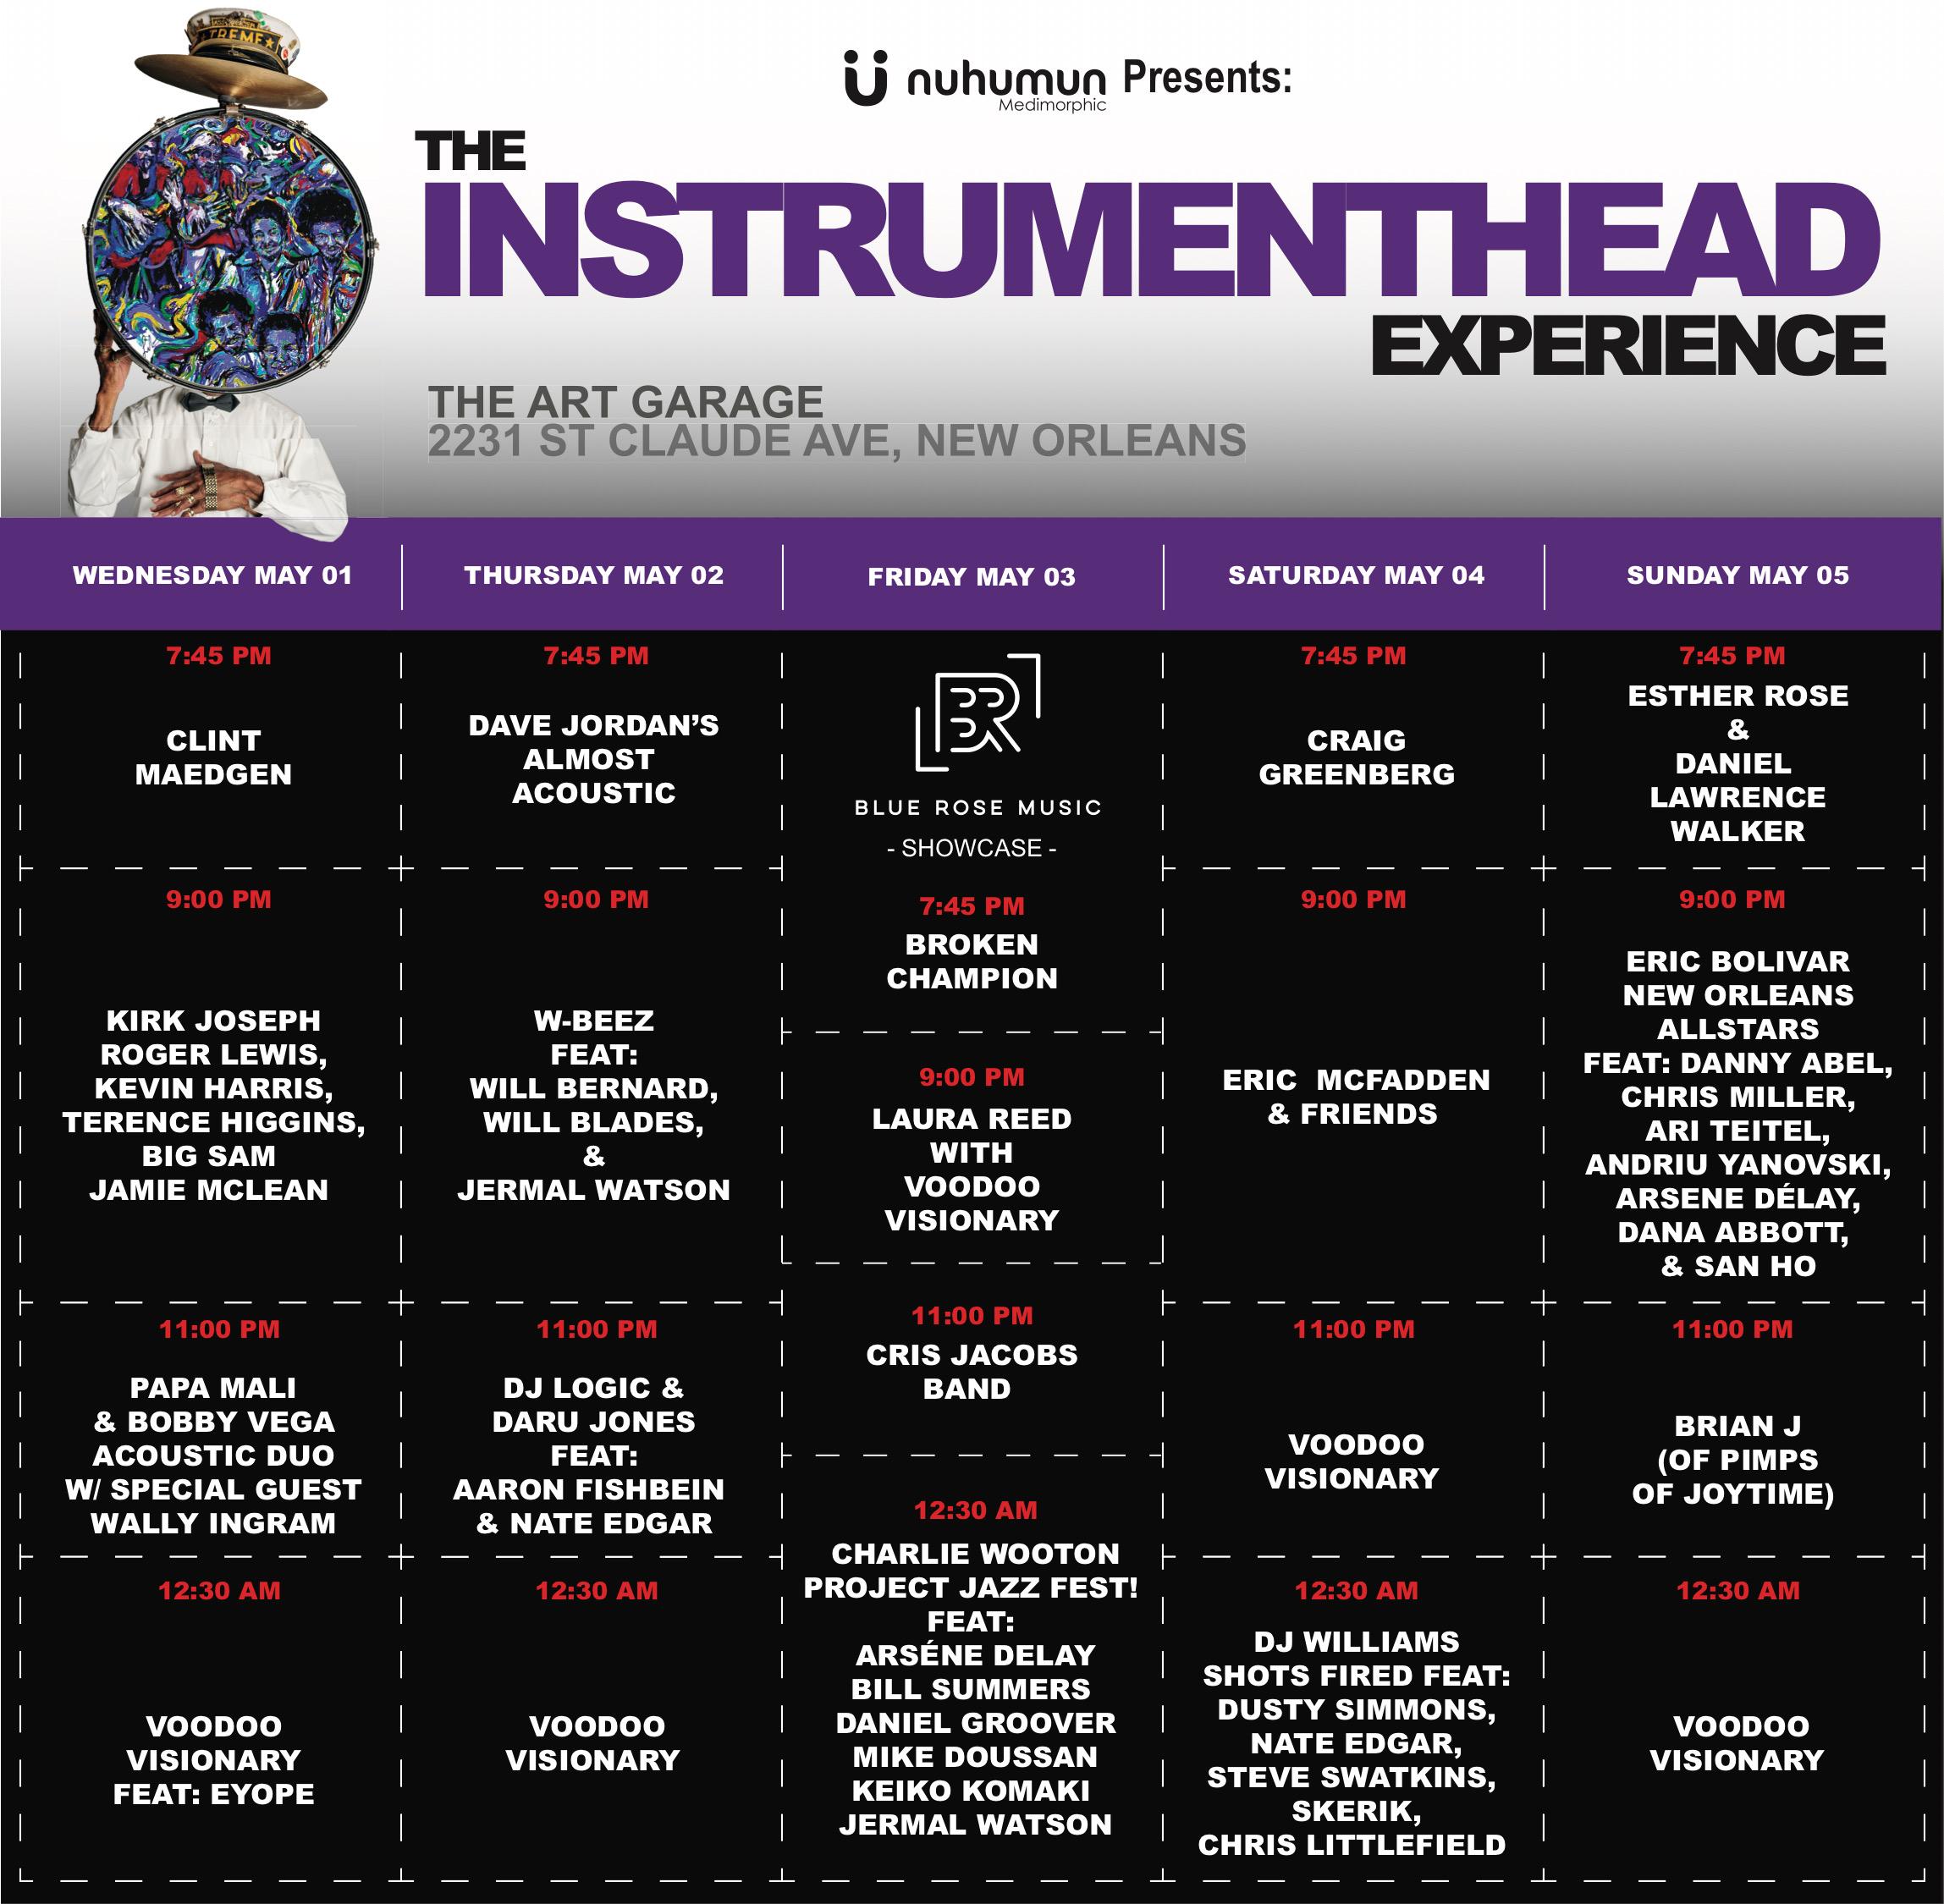 Instrumenthead Schedule_Final_4.18.19.jpeg